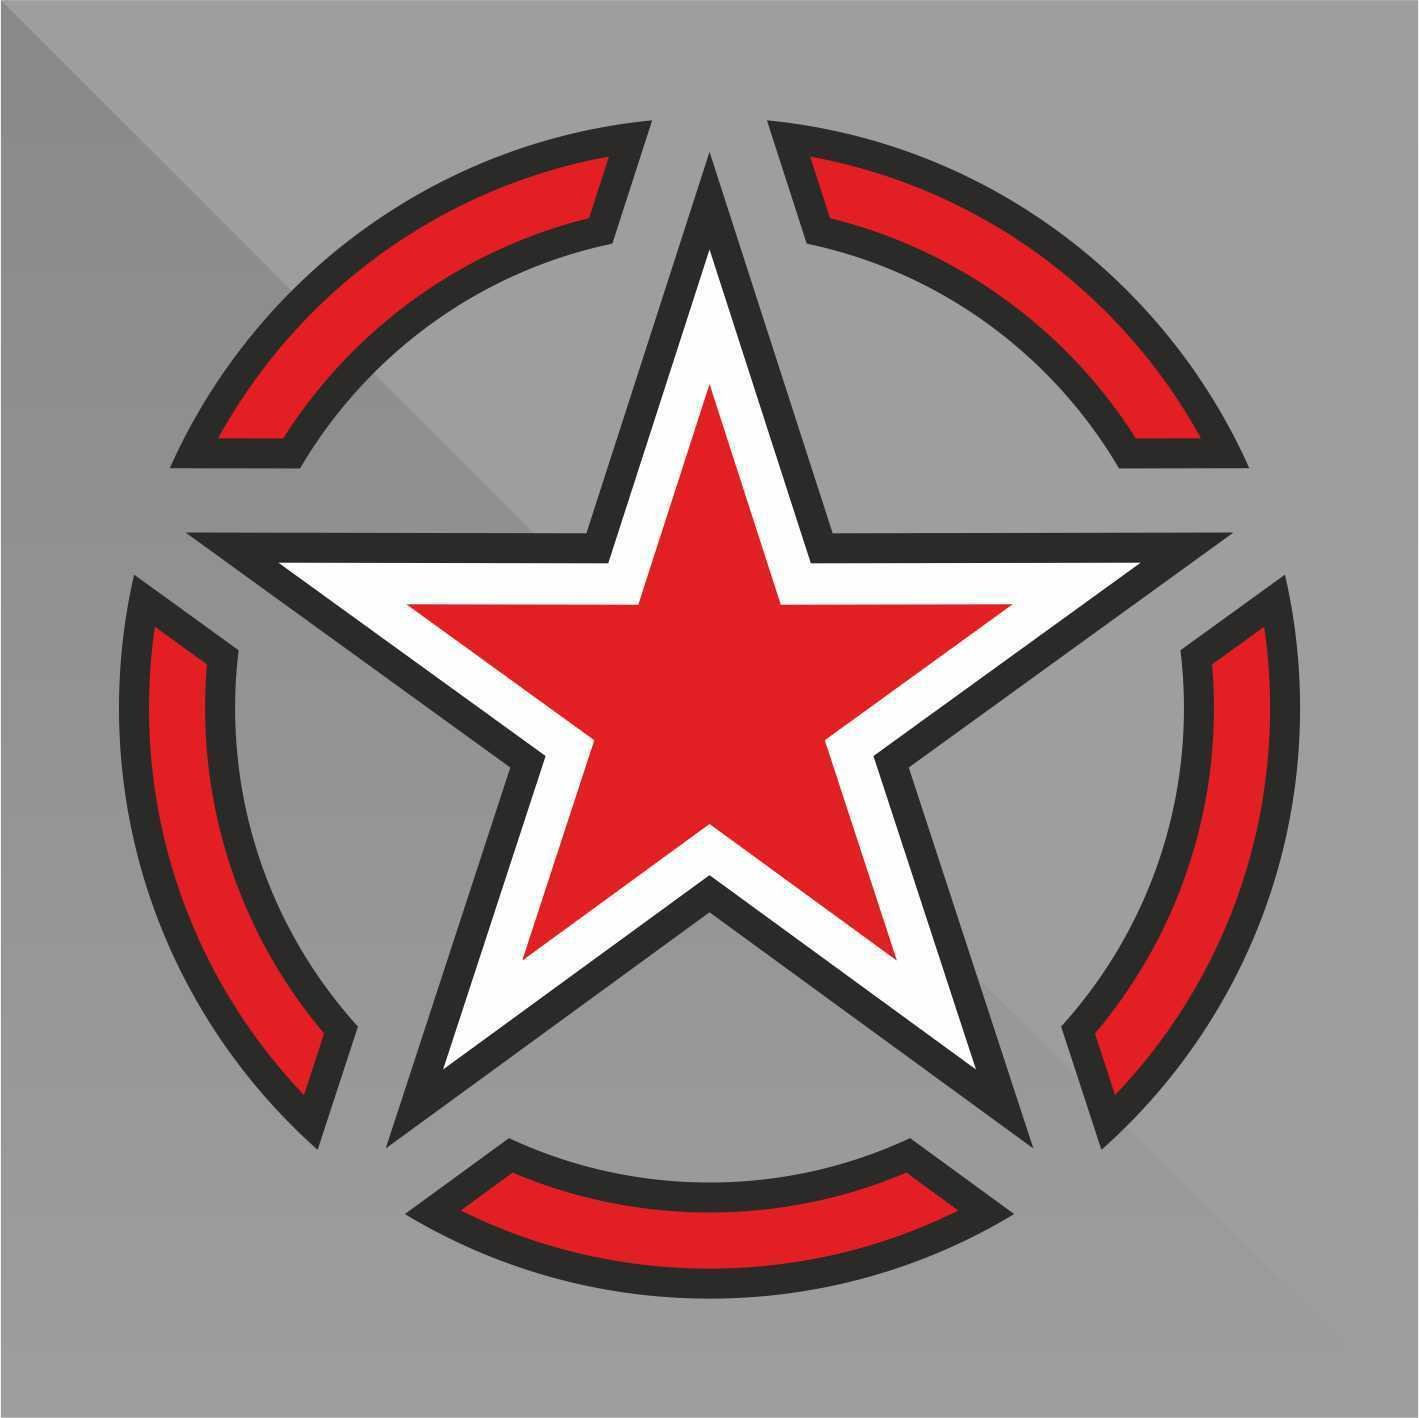 Sticker Stella Militare Military Star Militär Sterne estrella de los militares étoiles militaire - Decal Cars Motorcycles Helmet Wall Camper Bike Adesivo Adhesive Autocollant Pegatina Aufkleber - cm 10